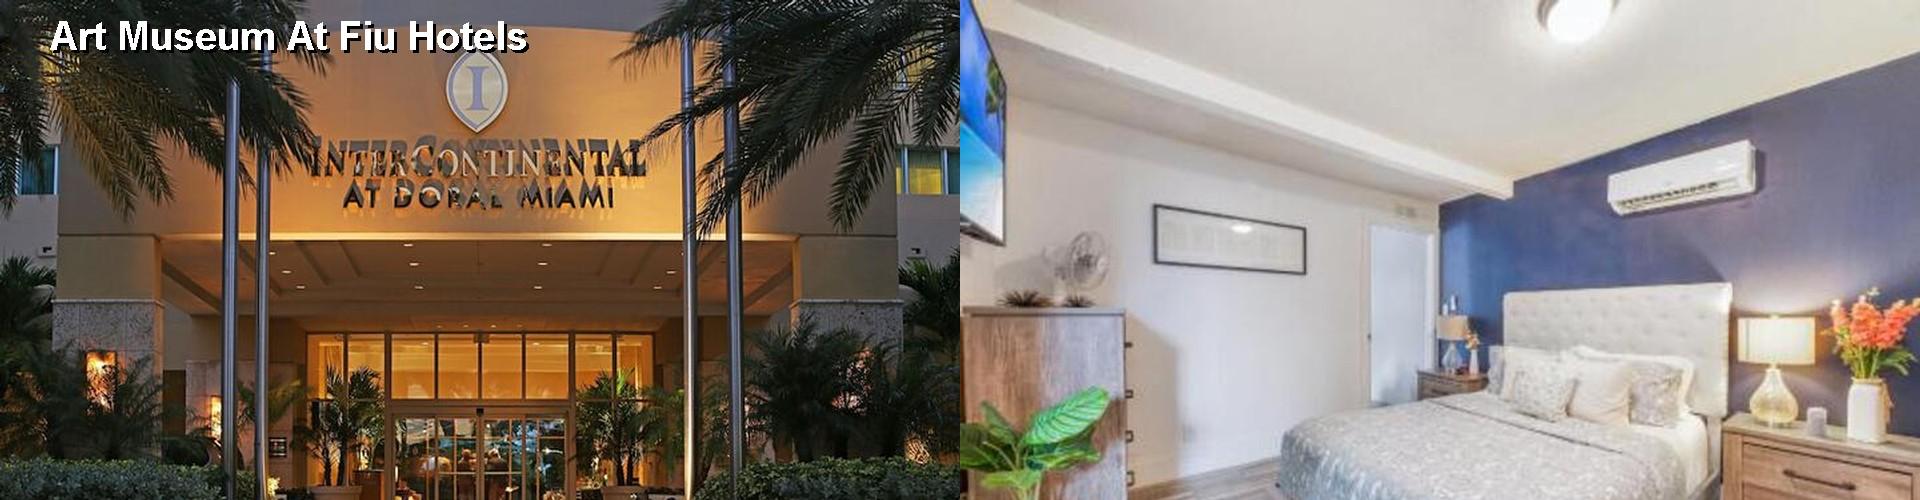 5 Best Hotels Near Art Museum At Fiu